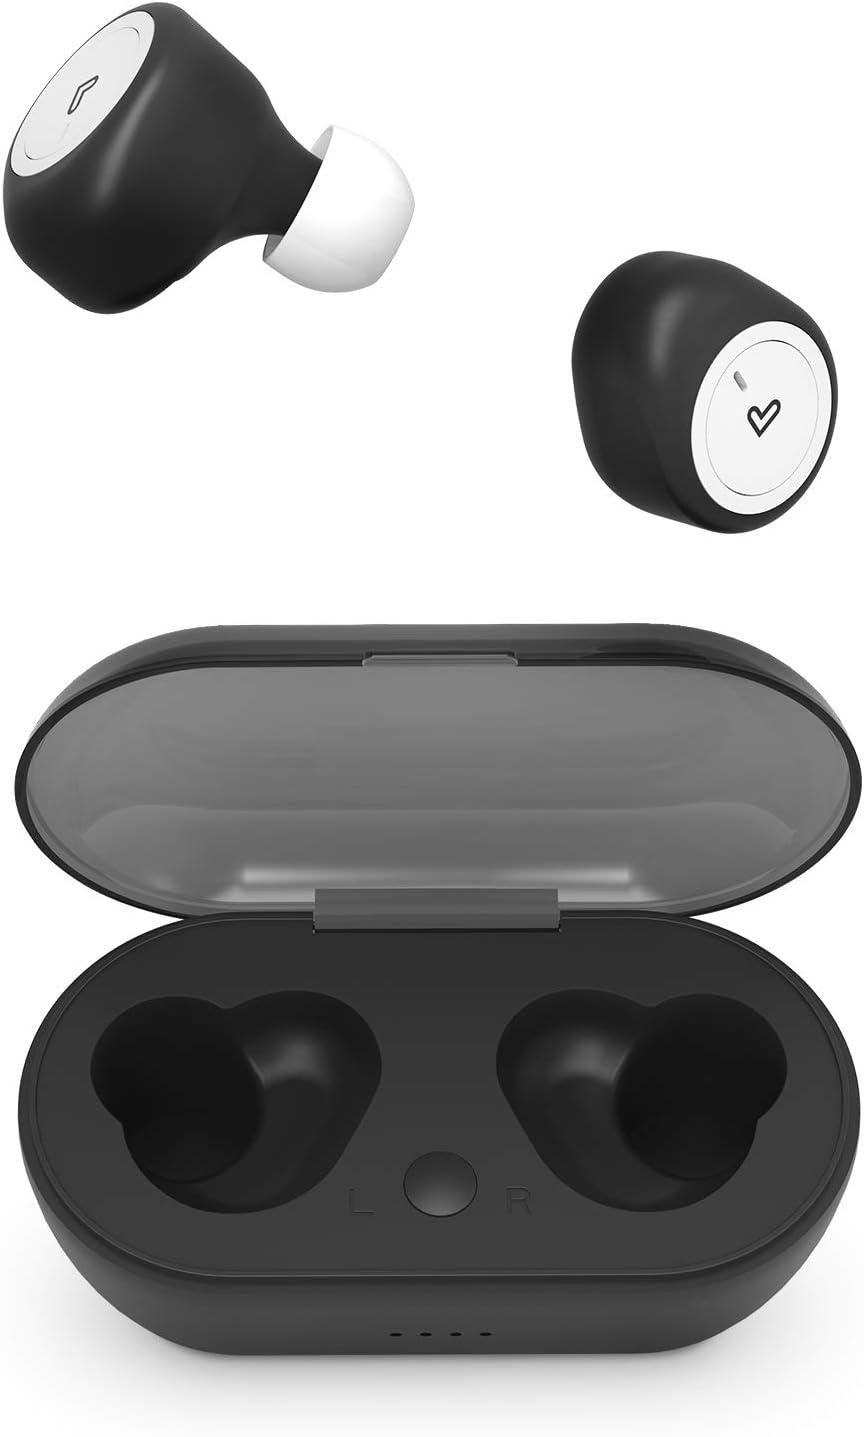 Energy Sistem Earphones Urban 1 True Wireless Black (Auriculares inalambricos, True Wireless Stereo, BT 5.0, Open&Play, Charging Case)